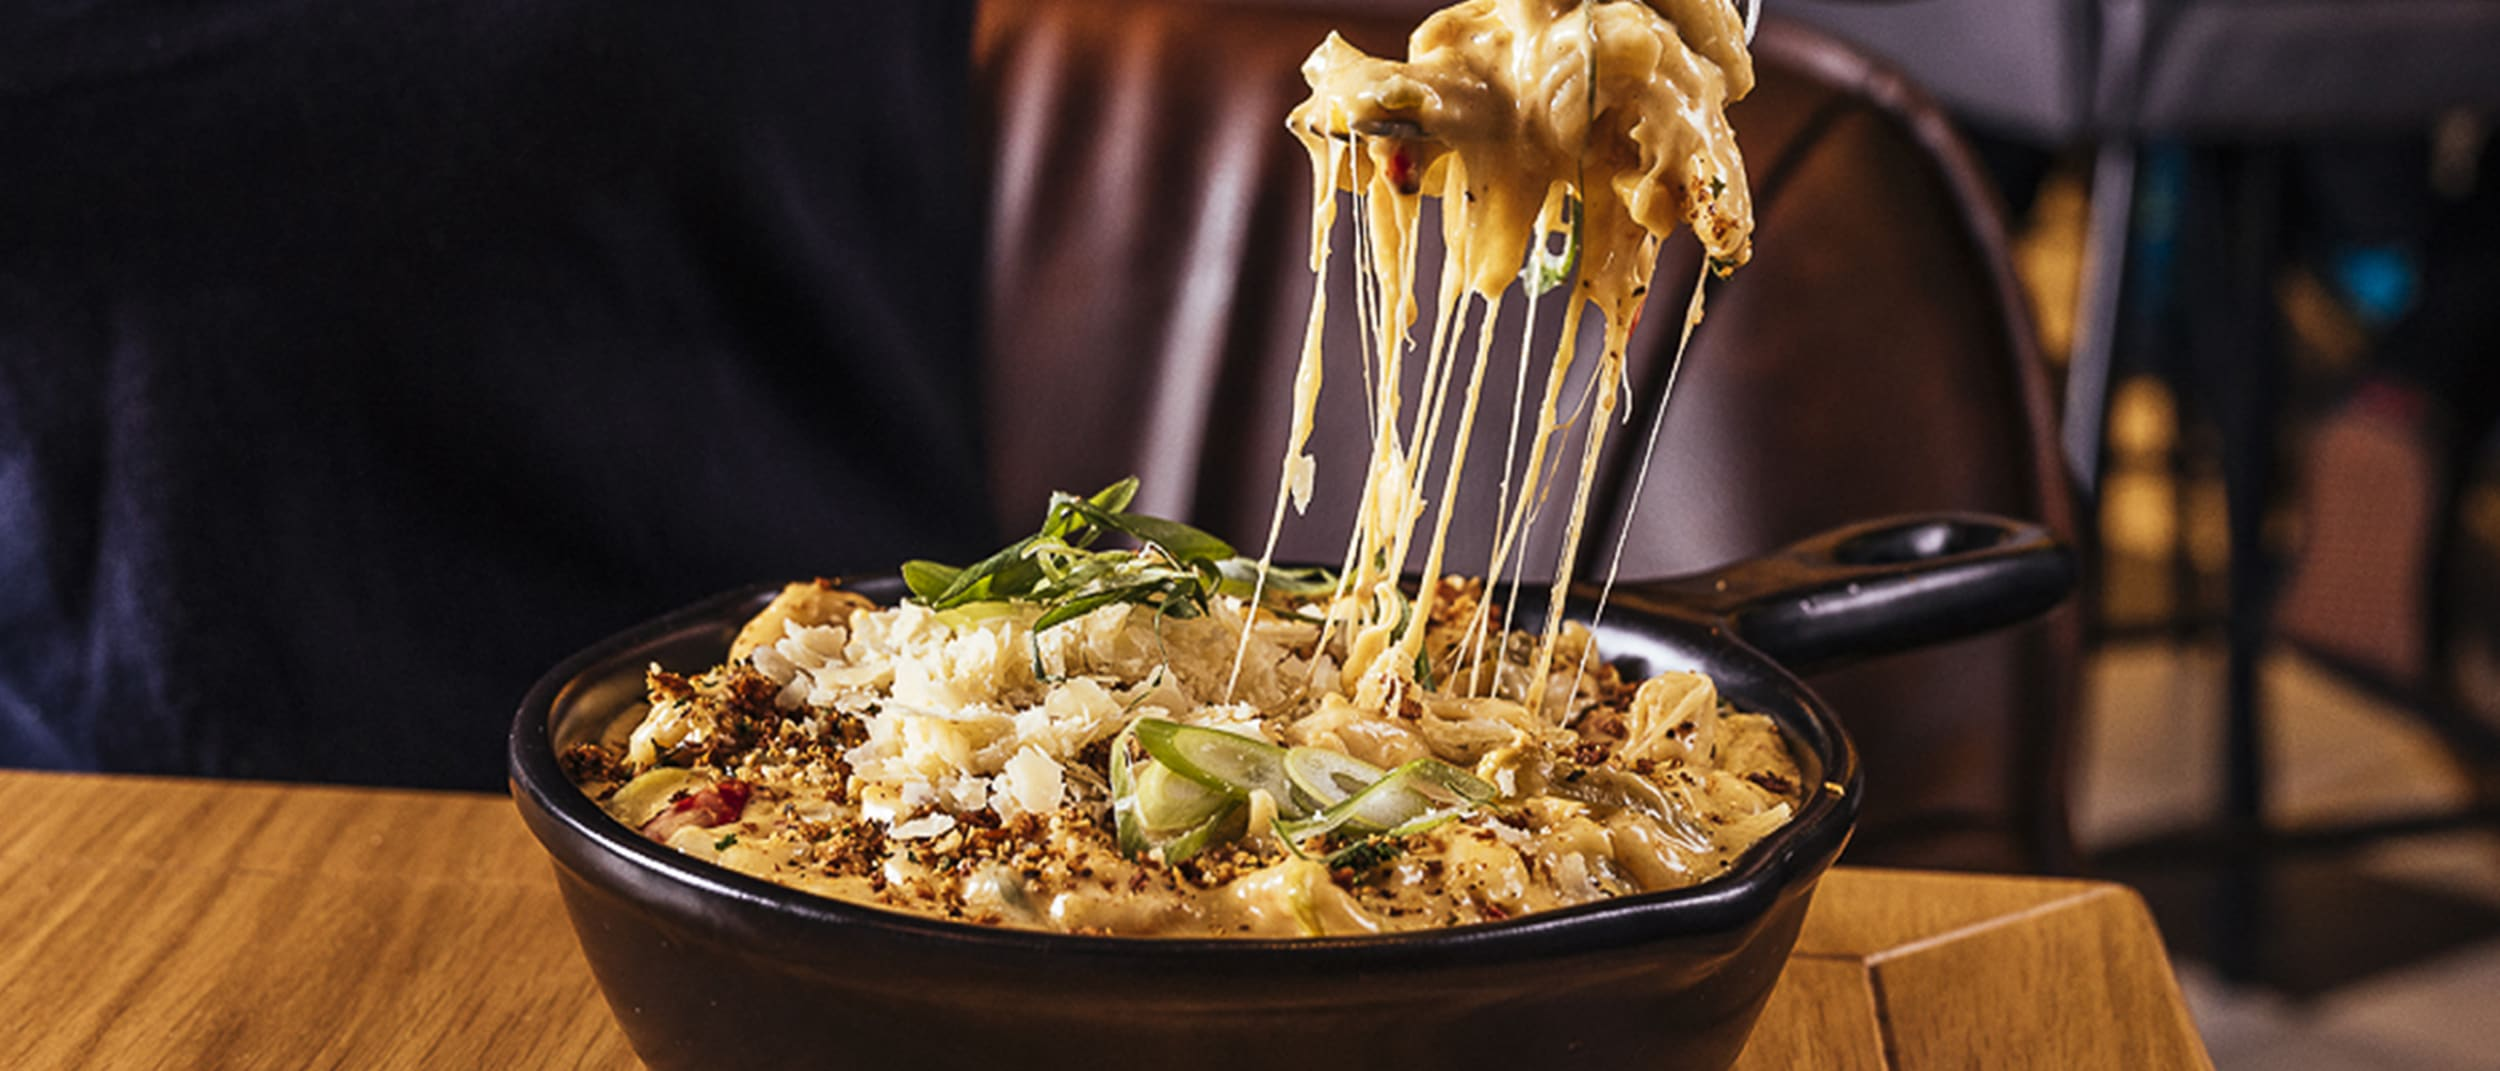 TGI Fridays: Mac 'n' cheese